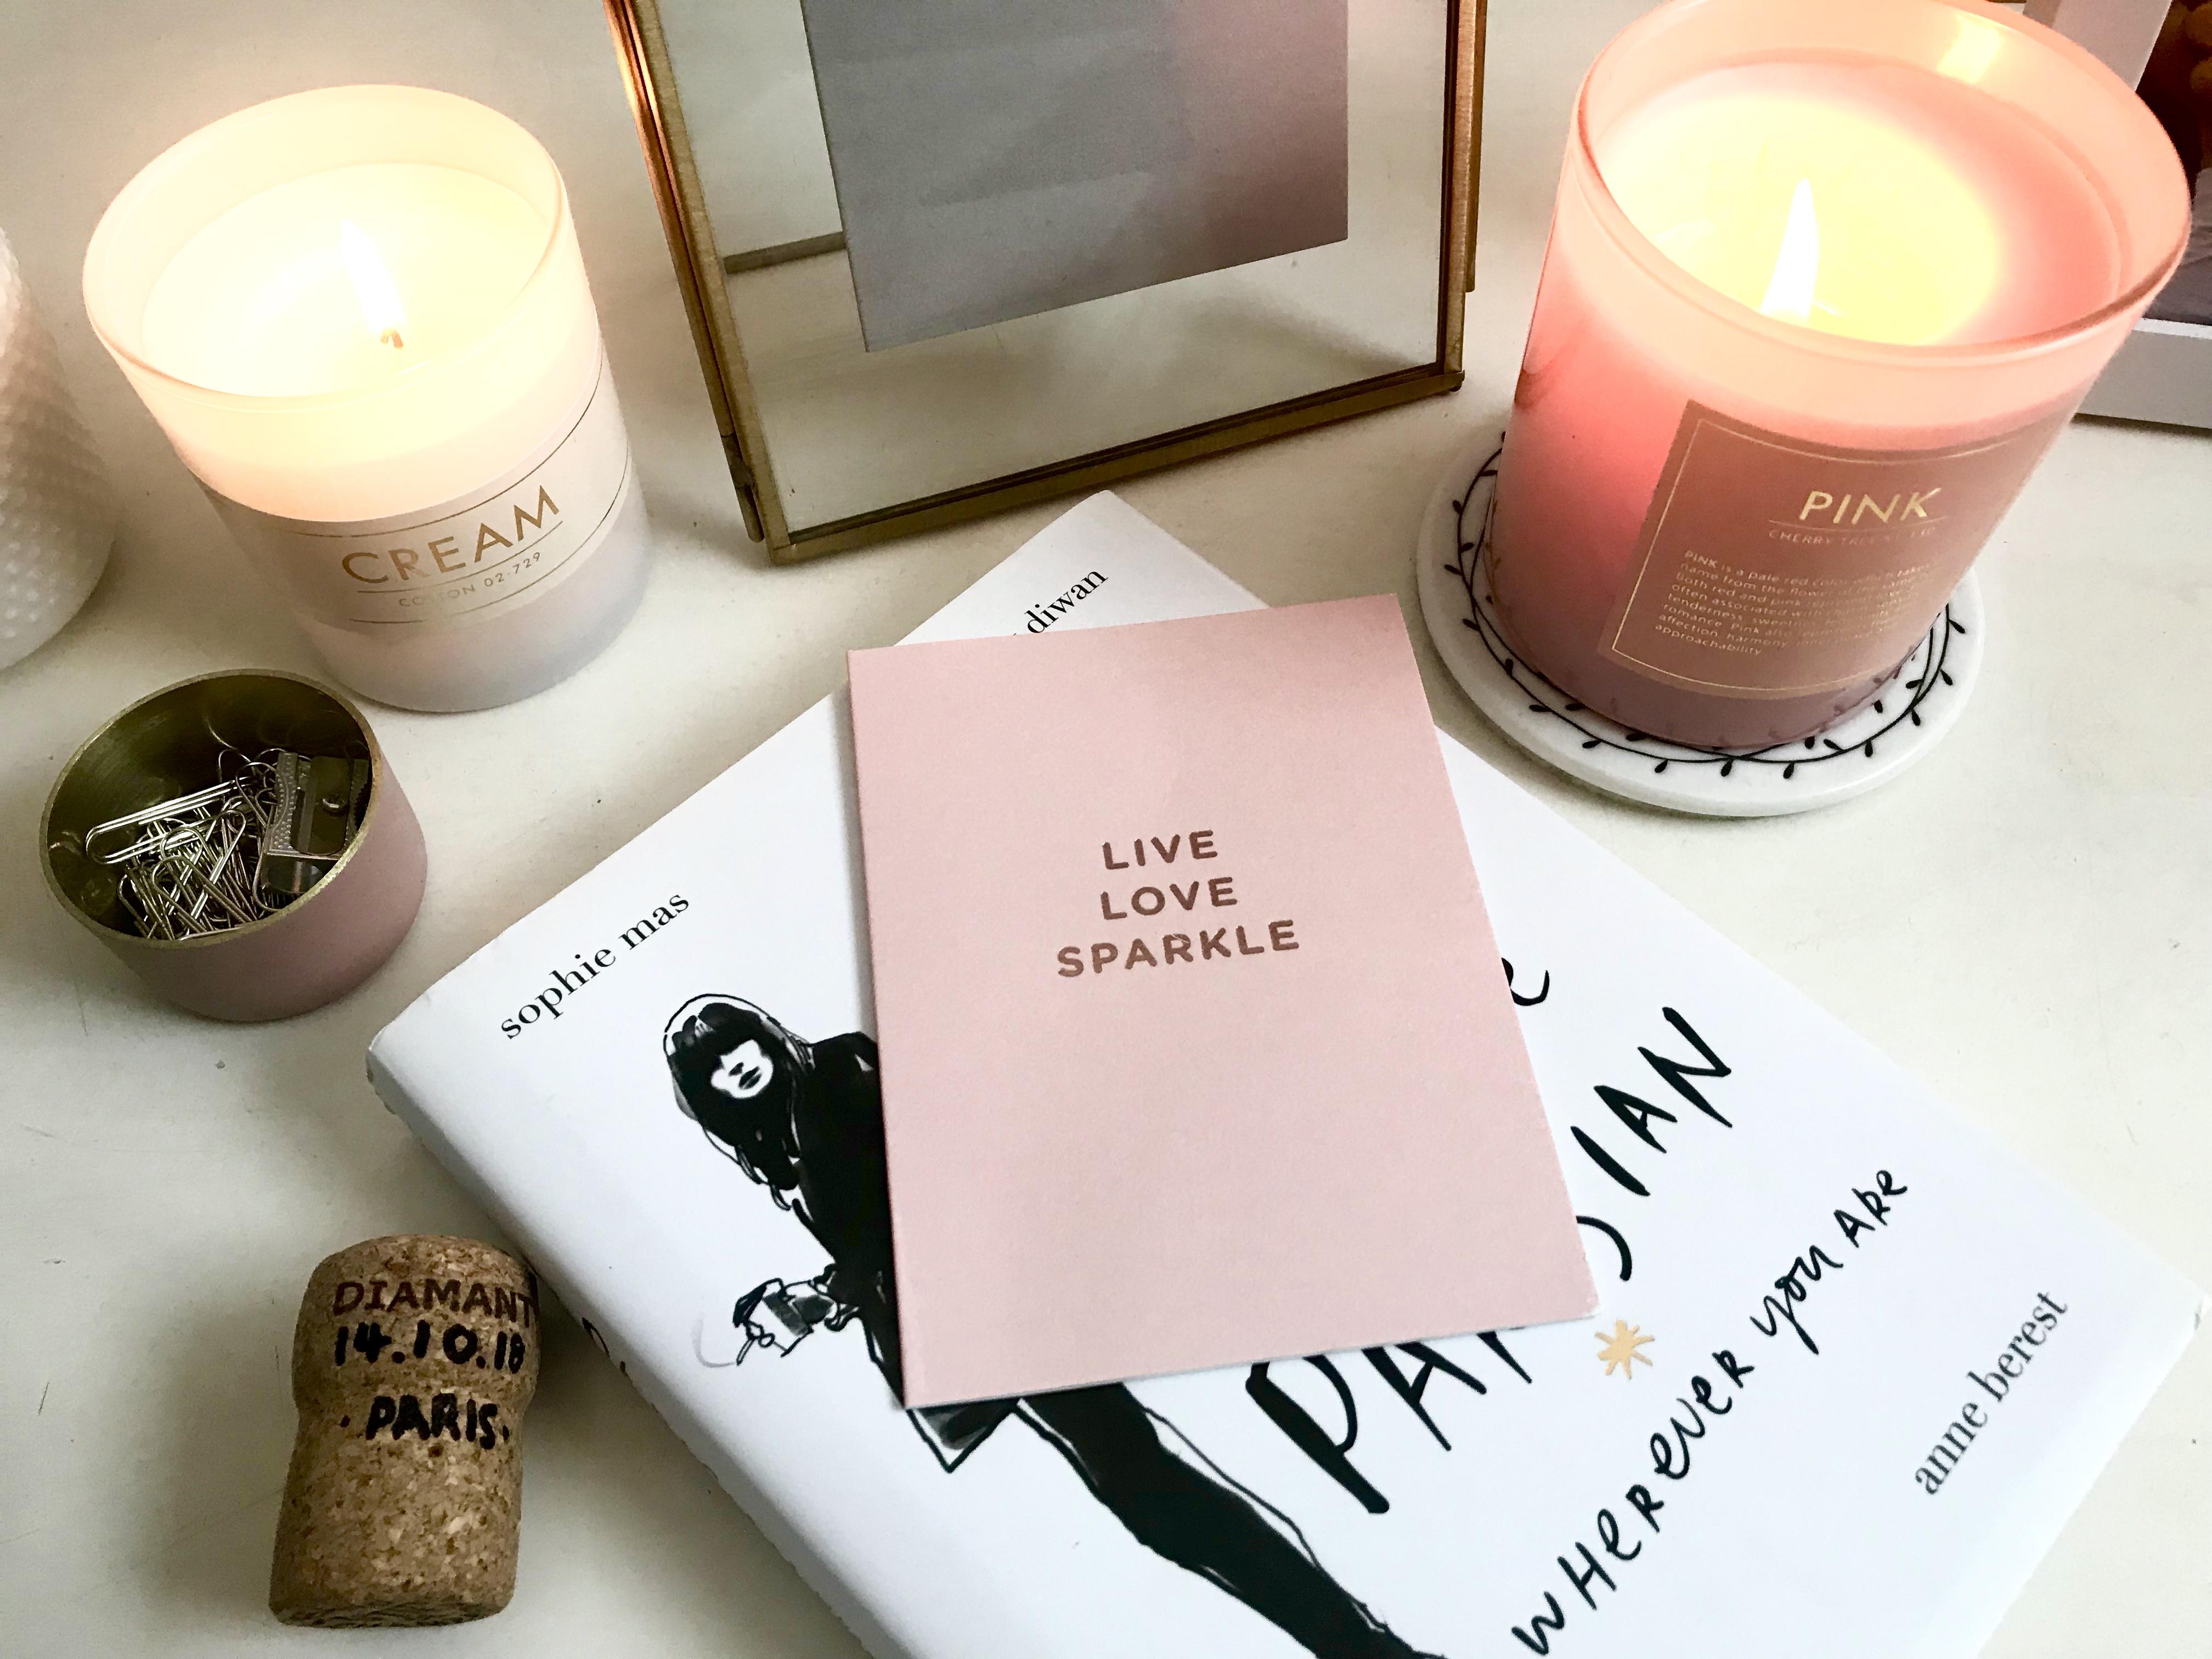 Live, Love, Sparkle